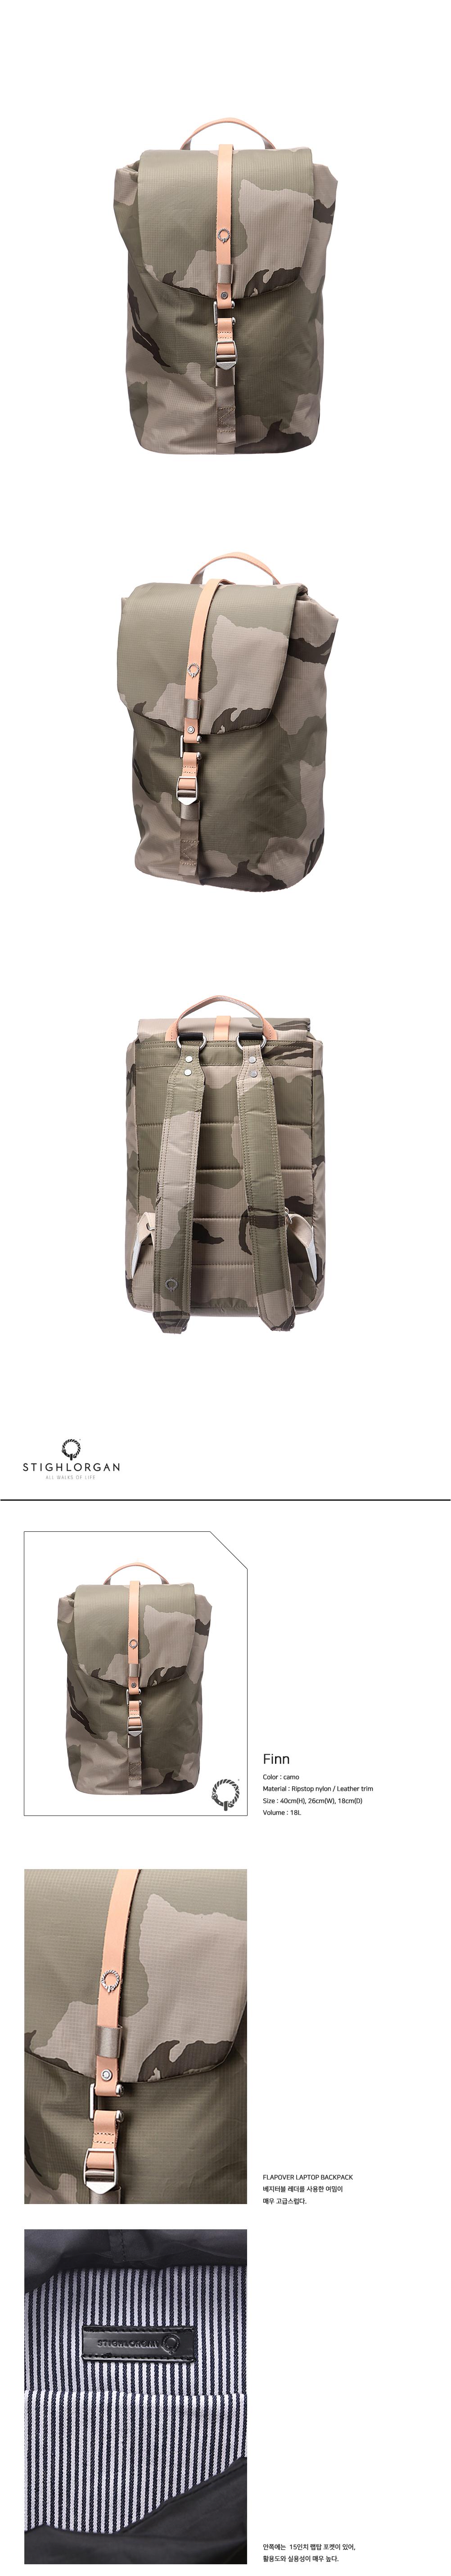 SSF SHOP - 삼성물산 패션부문 온라인 공식몰 8e7eec6980d1d